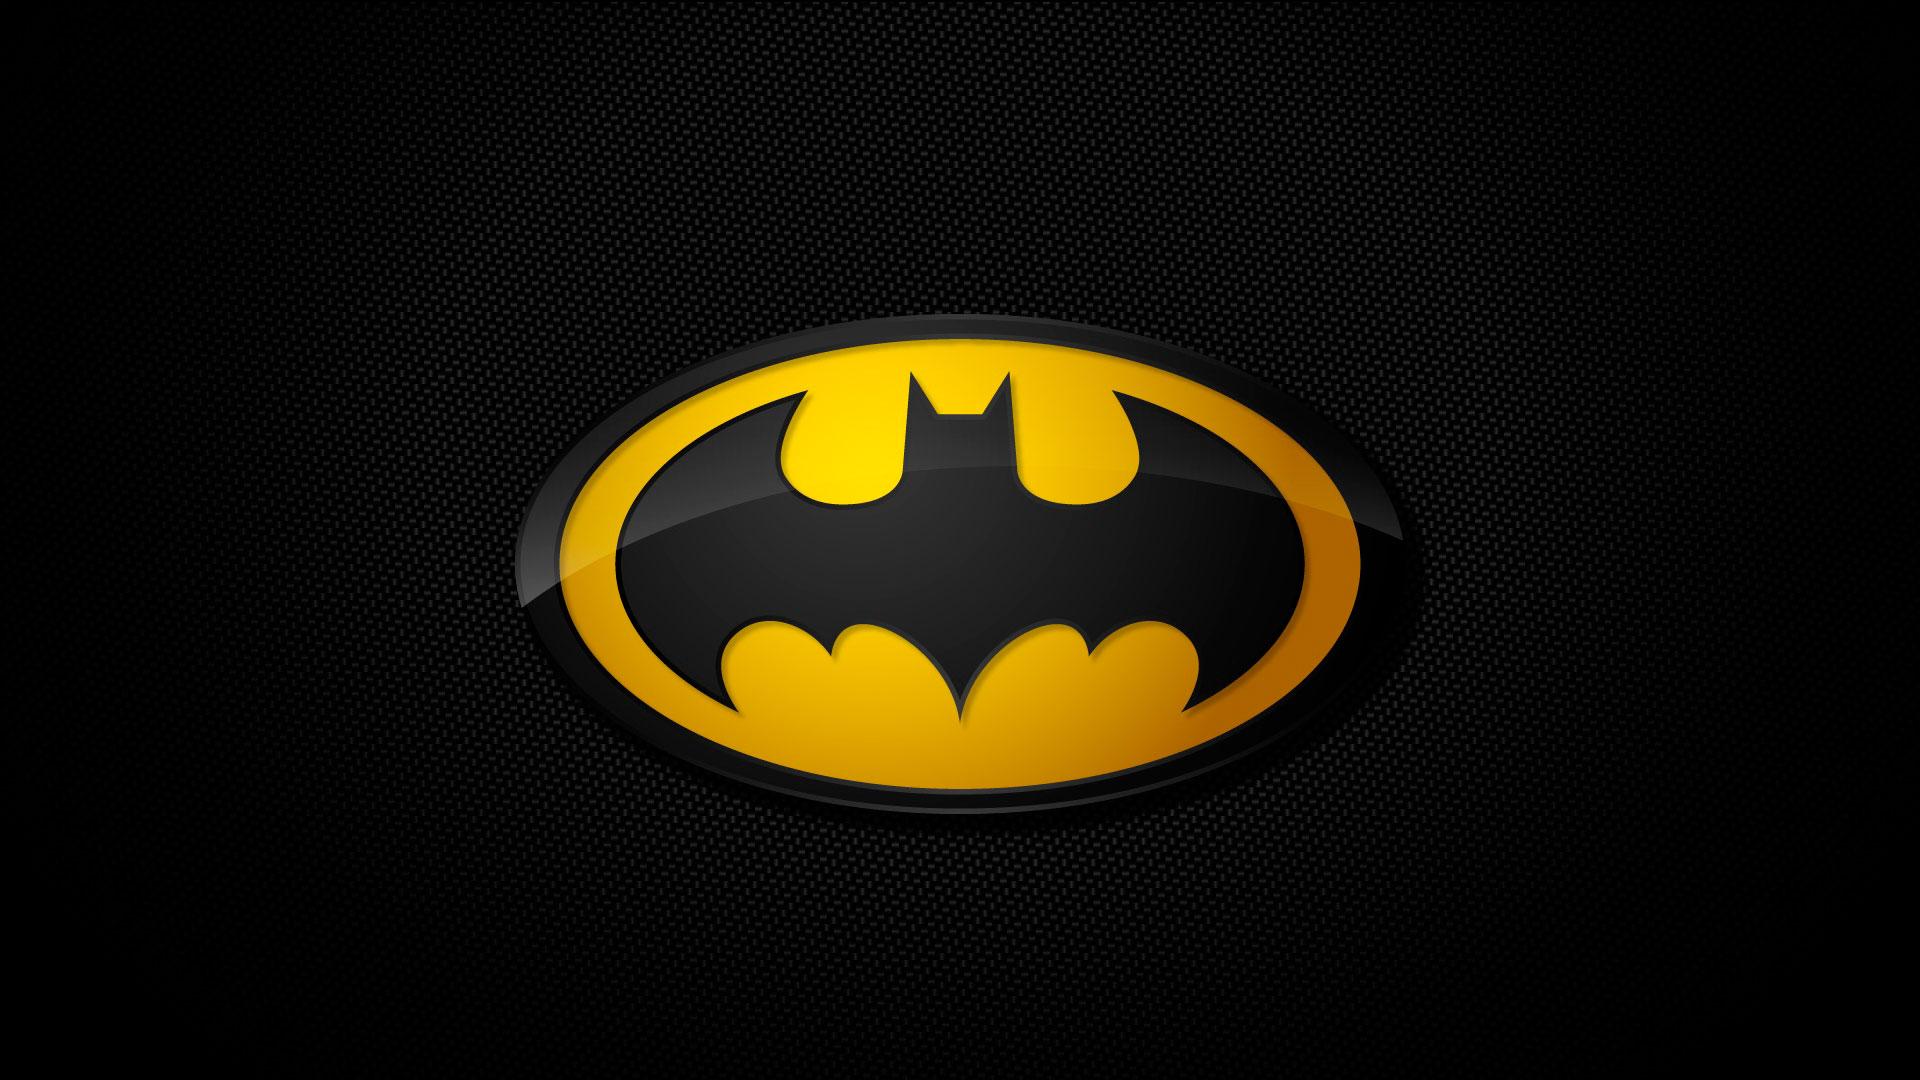 Широкоформатные обои символ бэтмена